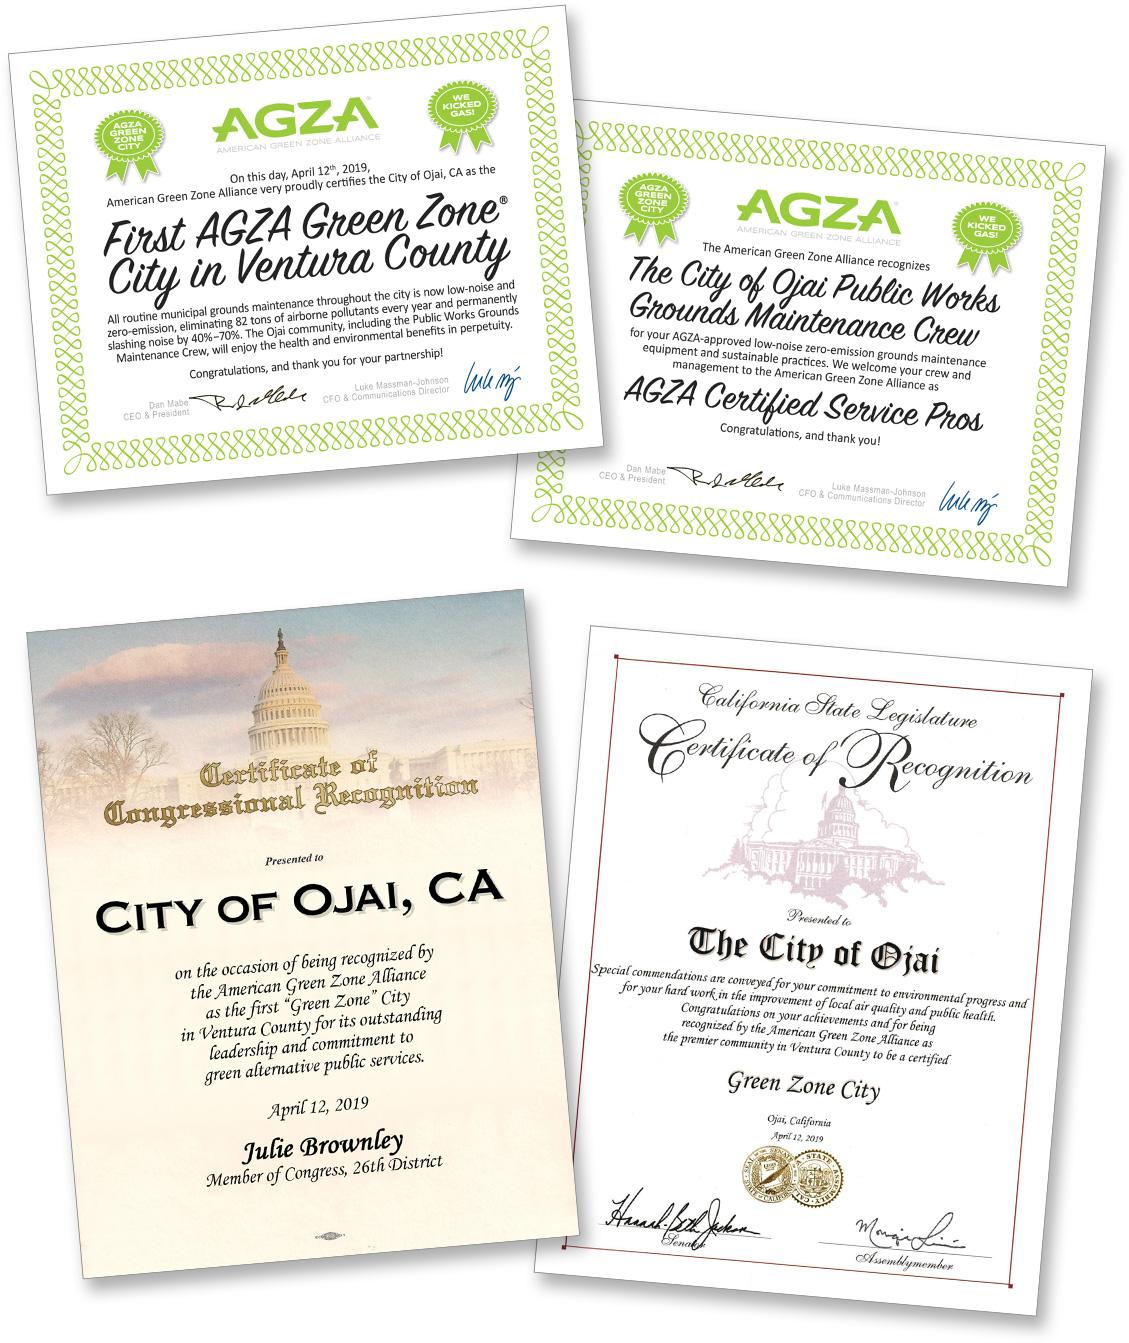 AGZA_GZ_Ojai_Certificates_4-up_COMPOSITE_BUILD_1200.jpg